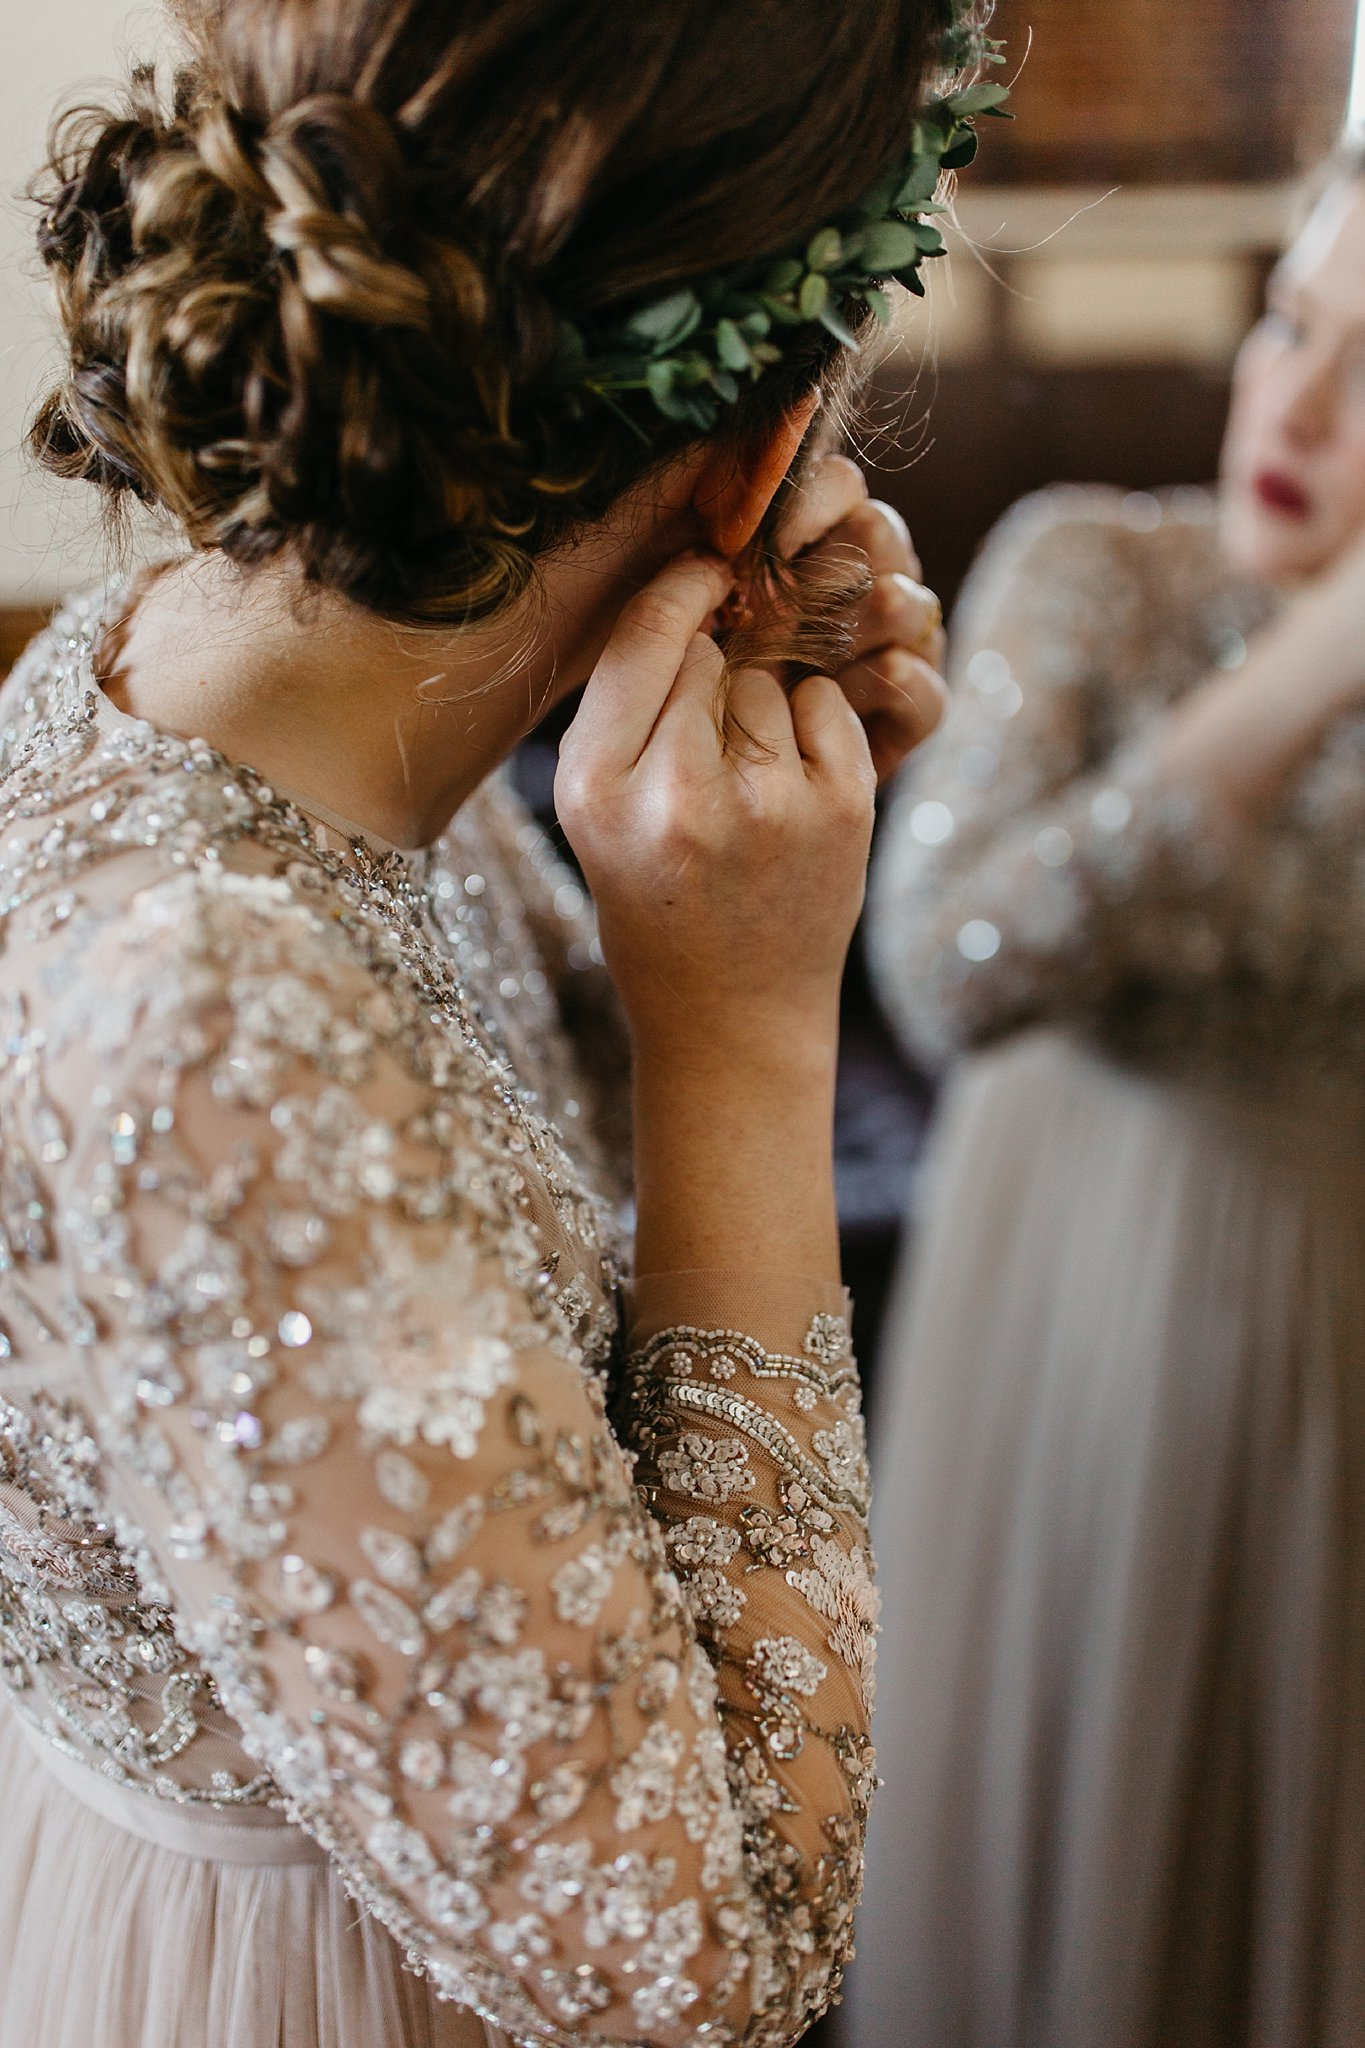 Wilderlove Co_Waco Texas_The Phoenix_Romantic Wedding Photography_0010.jpg